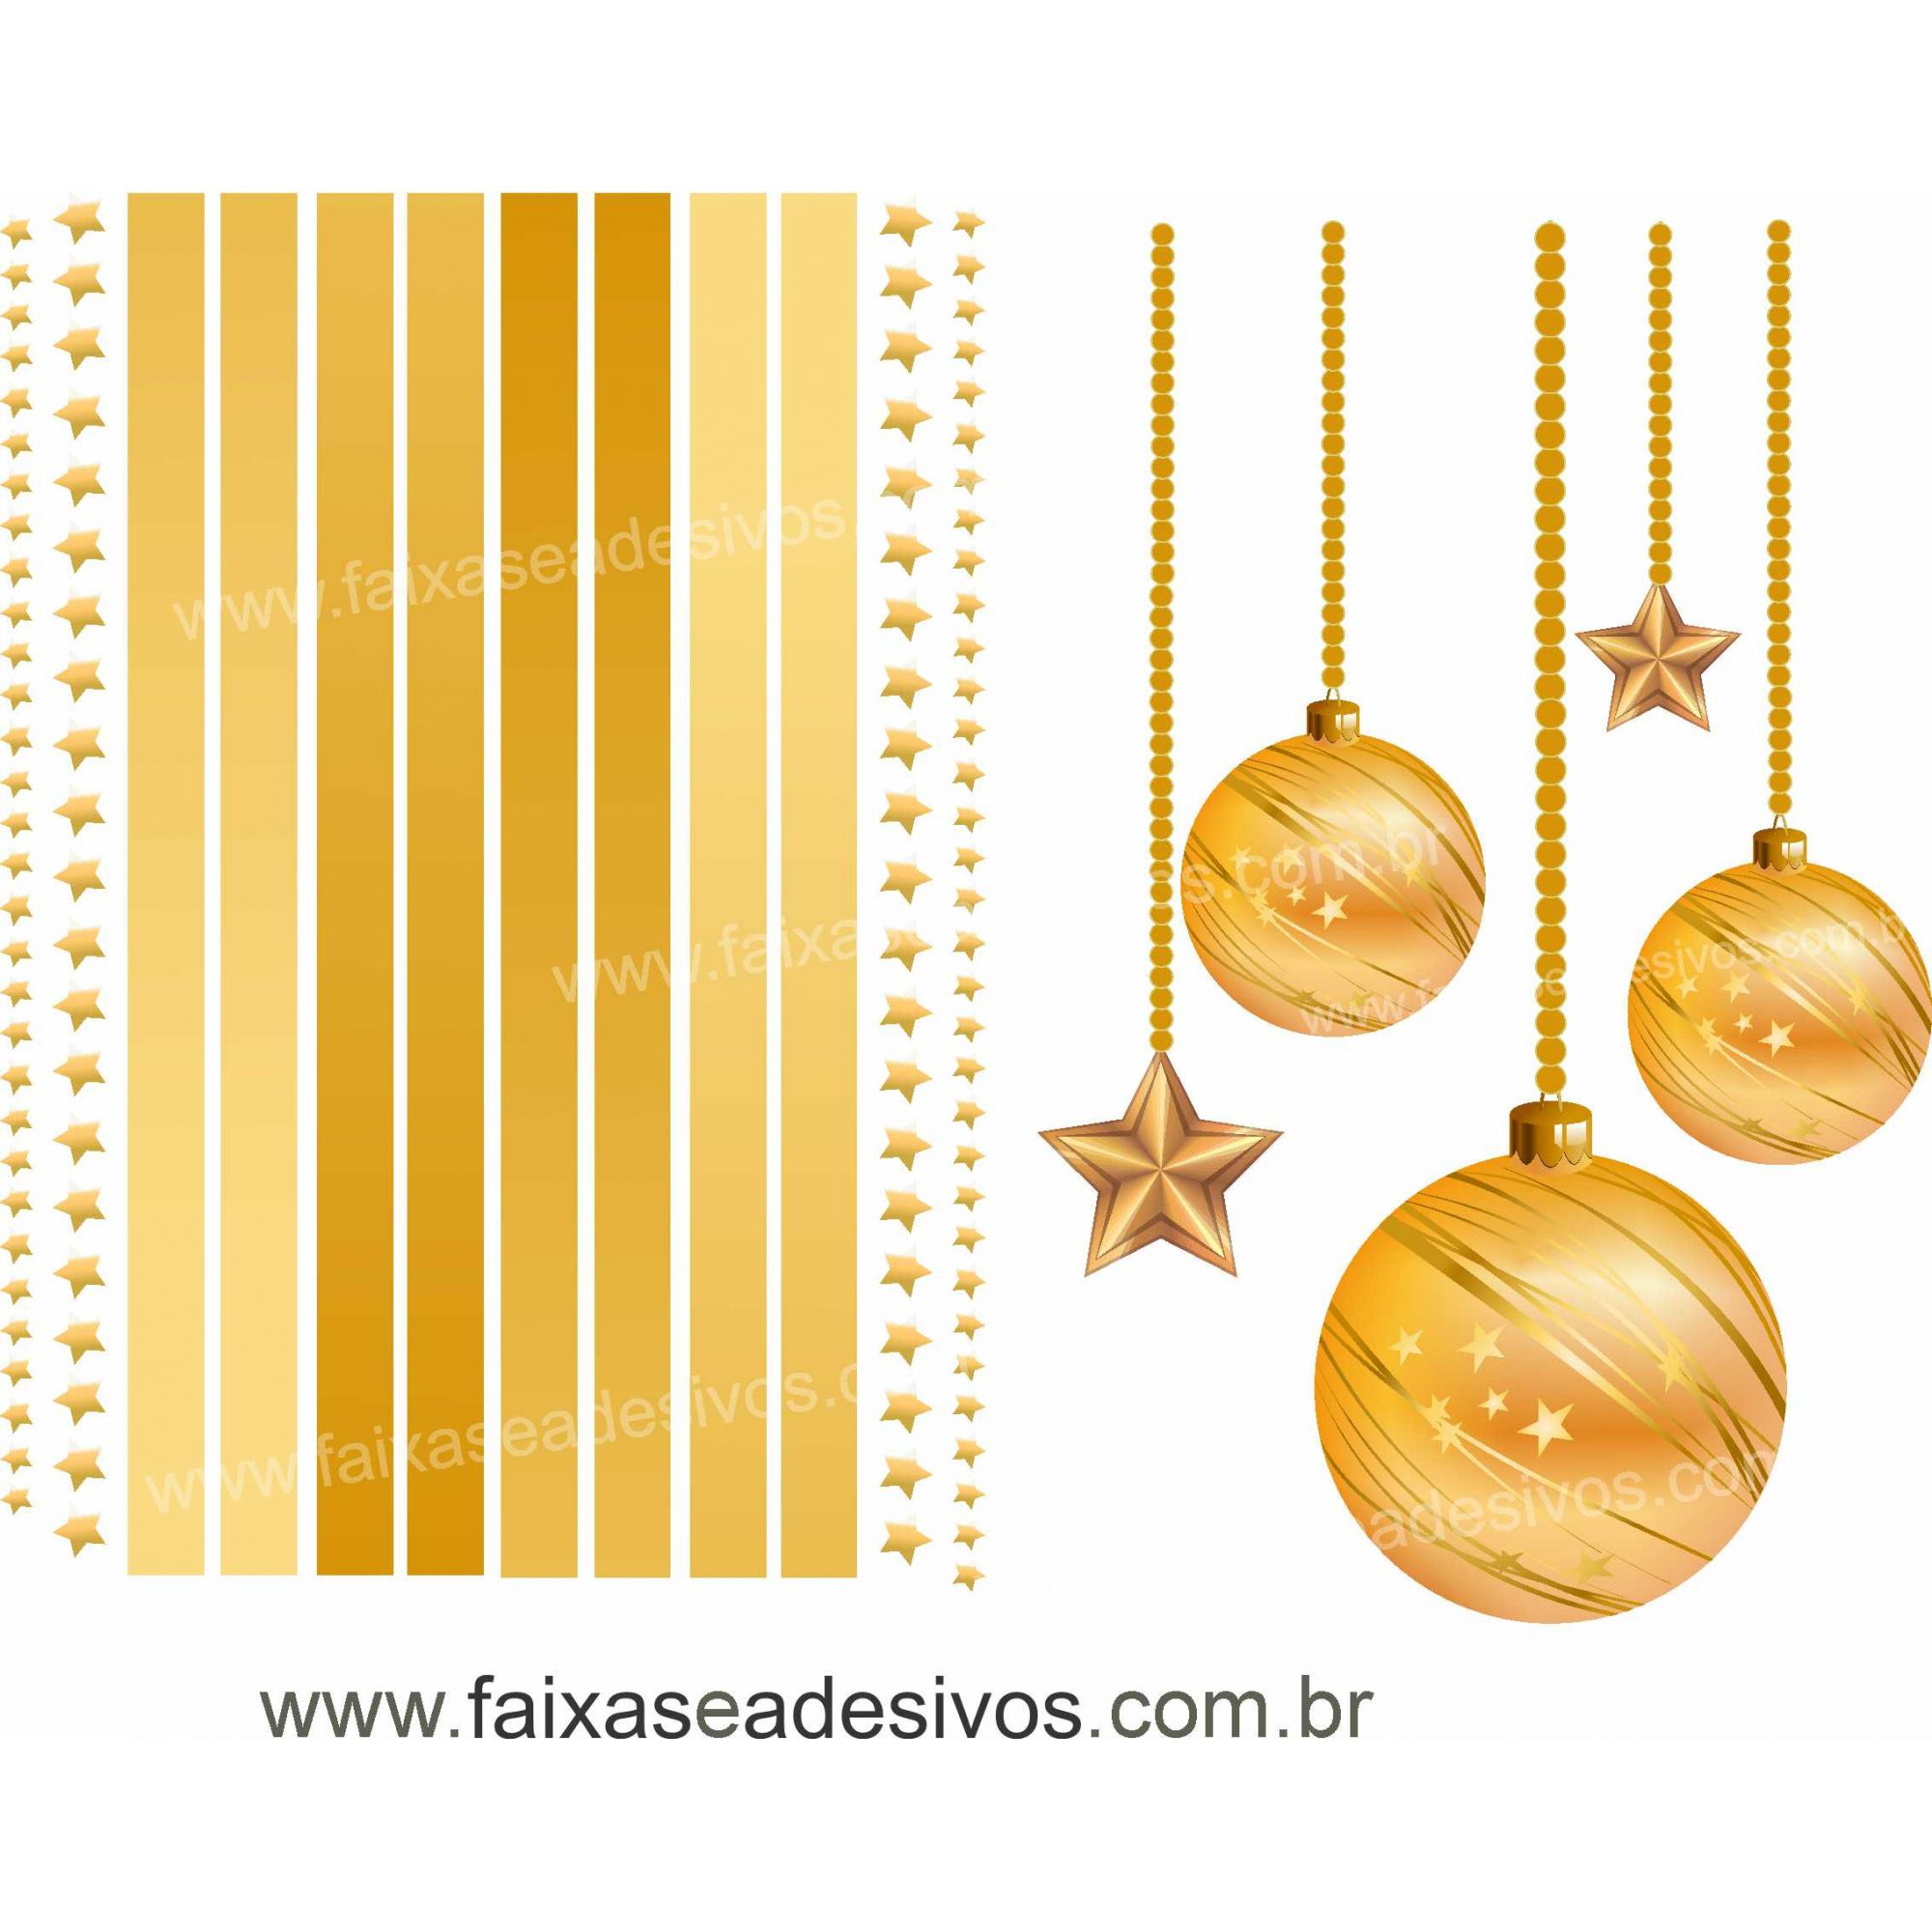 0199 - Adesivo Moldura Vitrine Dourada  - Fac Signs